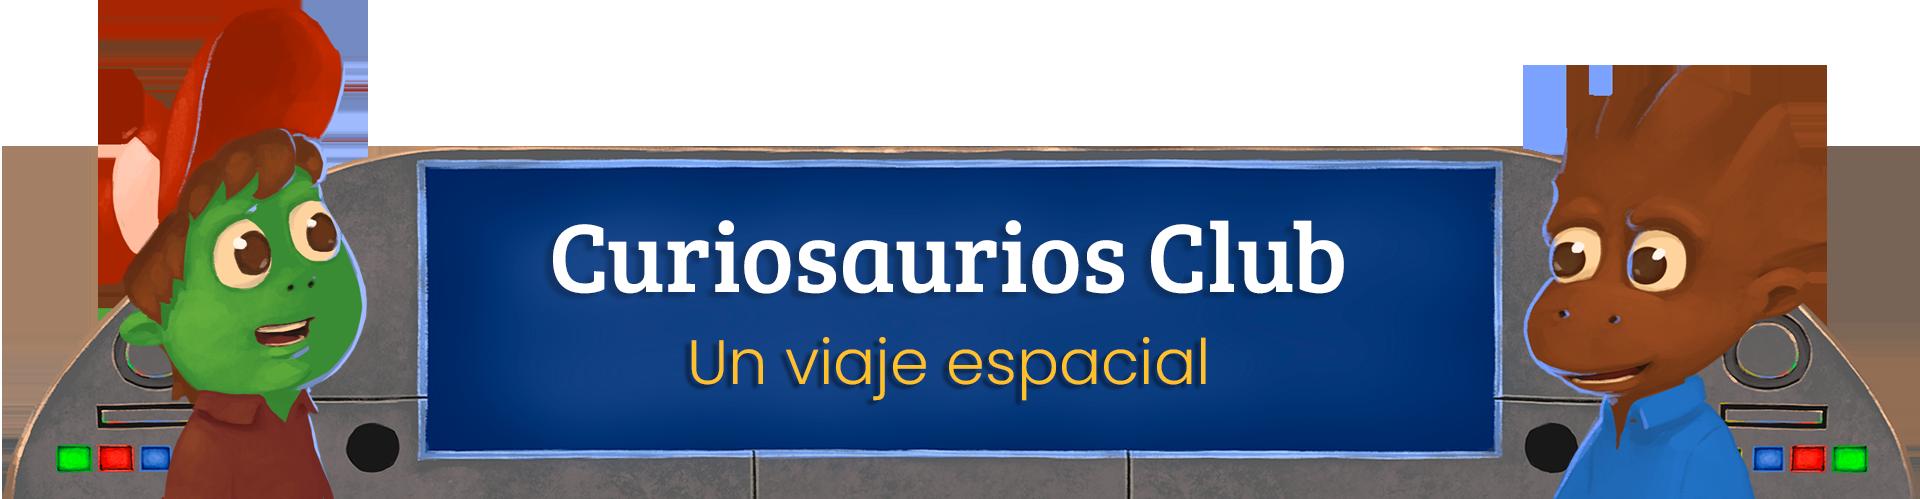 Curiosaurios Club. Un viaje espacial